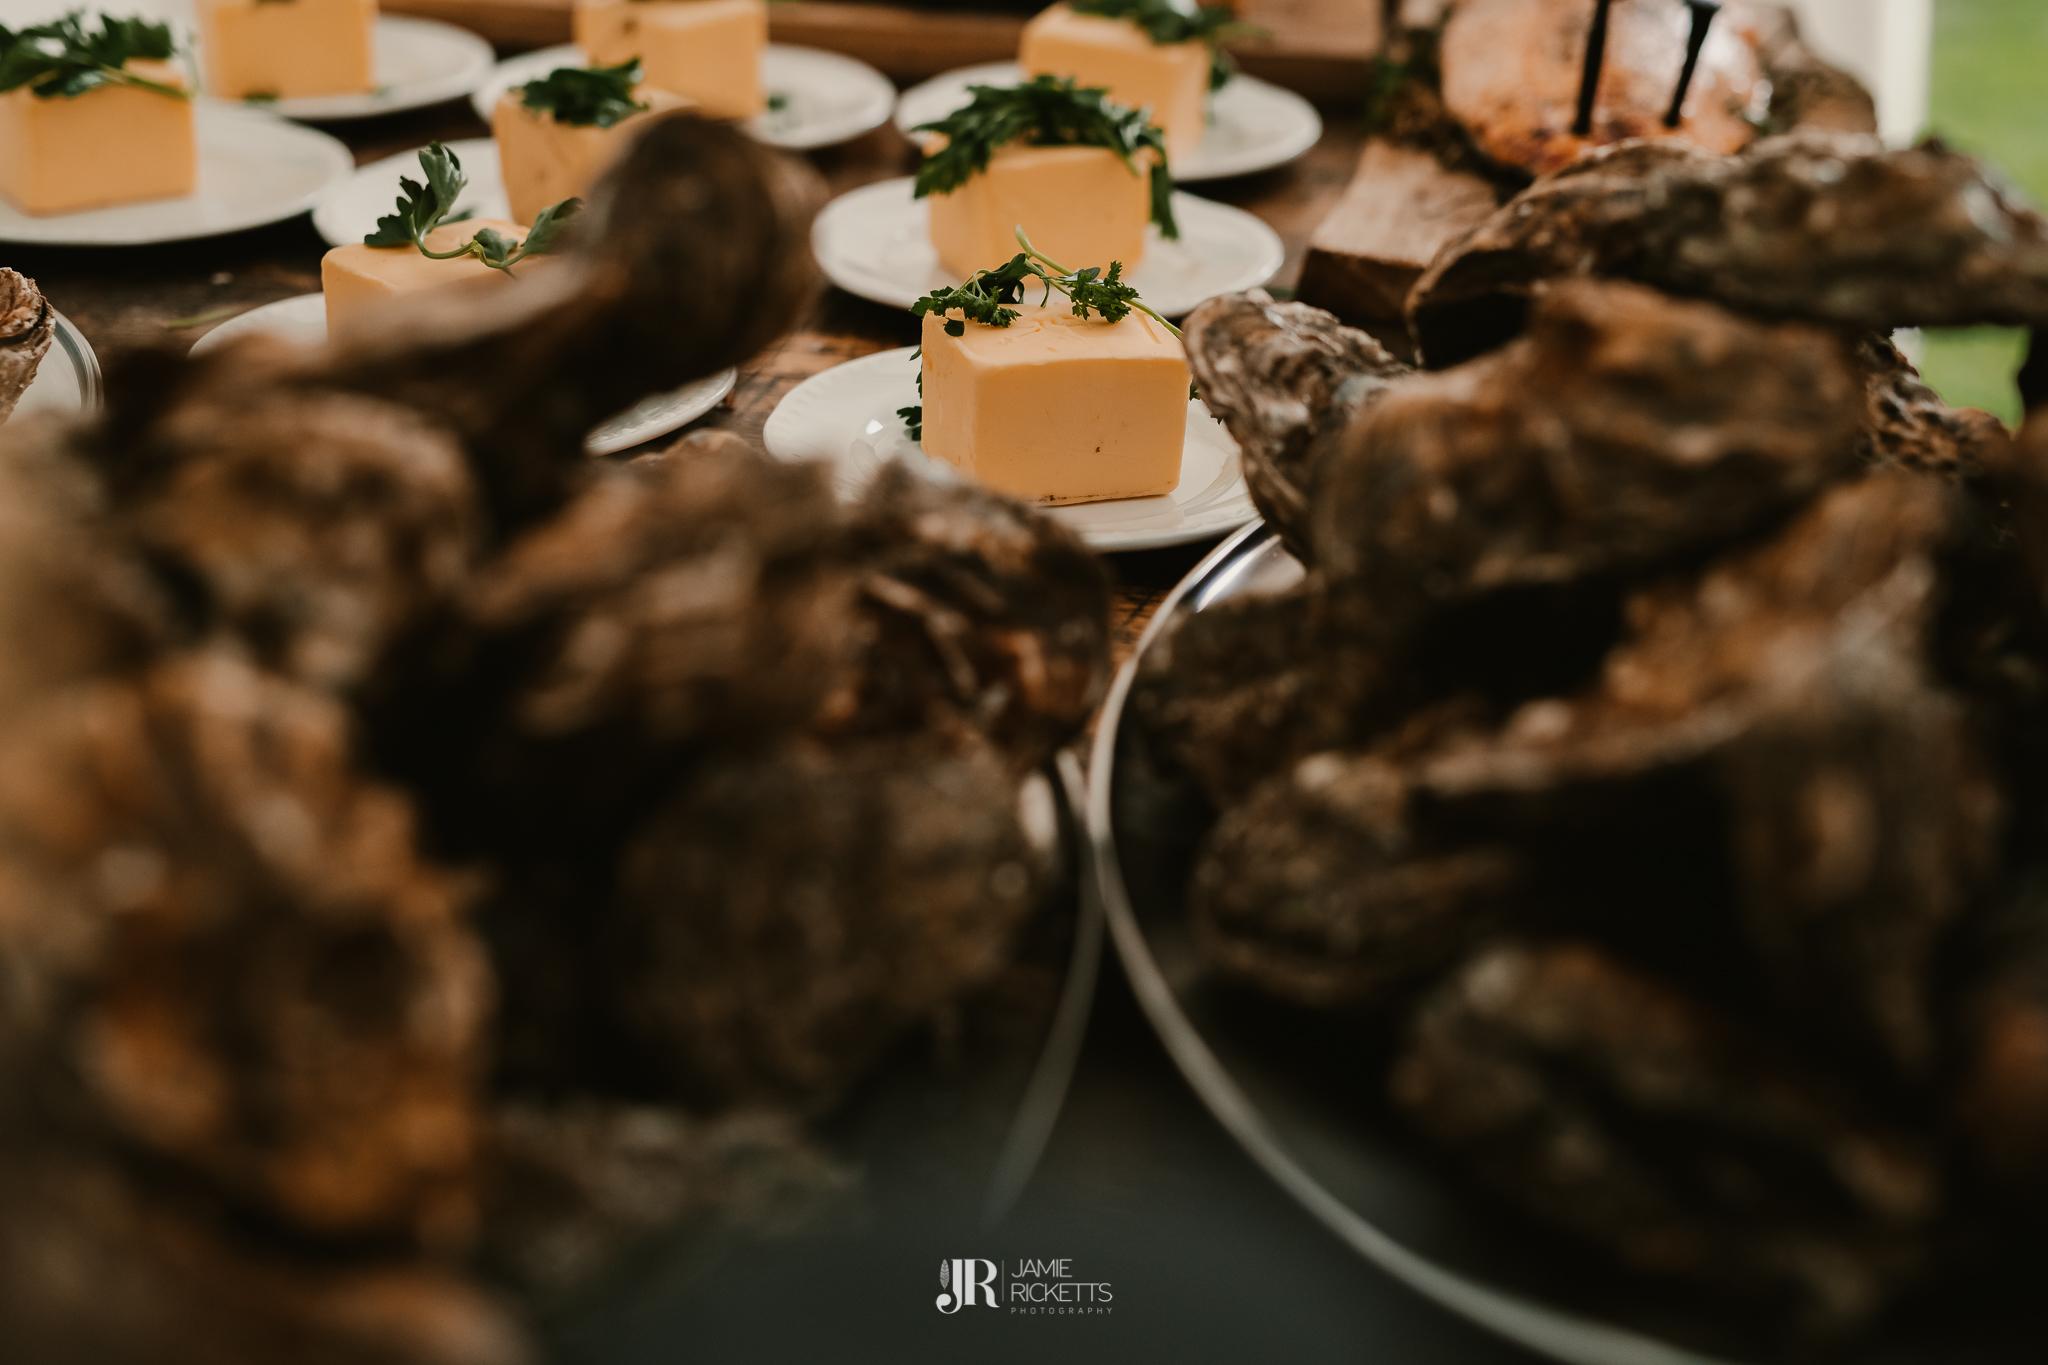 BBQ BANQUET NIGHT-28.06.2019-JR-SM-42.JPG